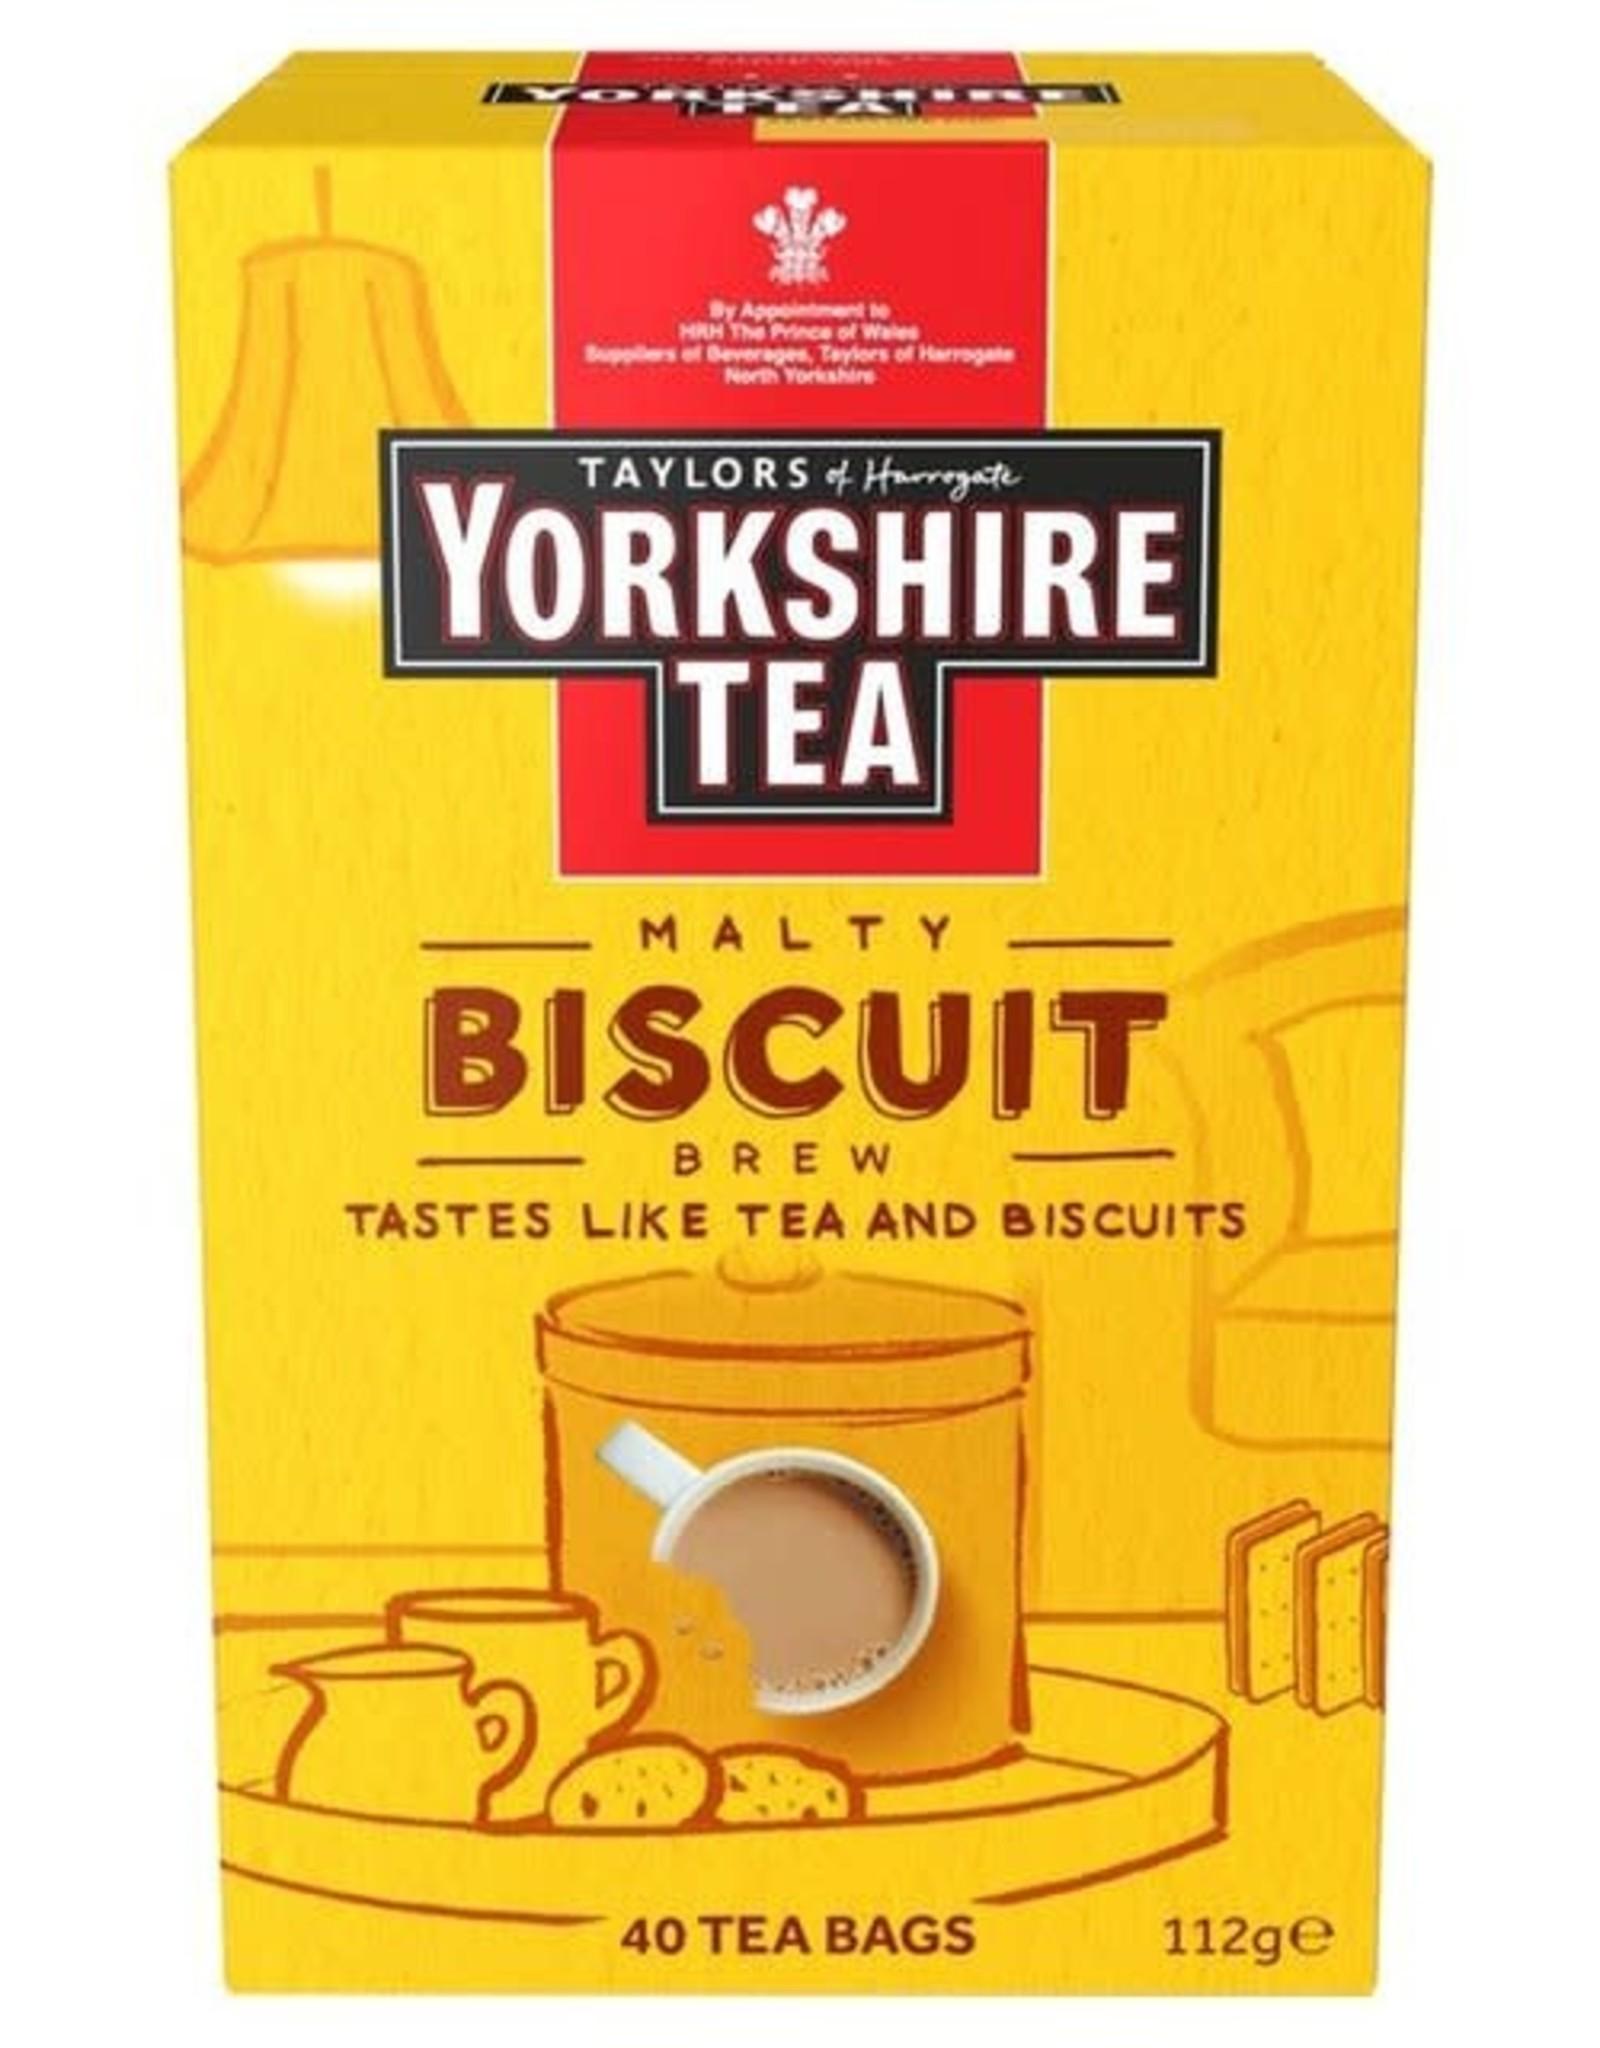 Yorkshire Yorkshire Tea Malty Biscuit 40's